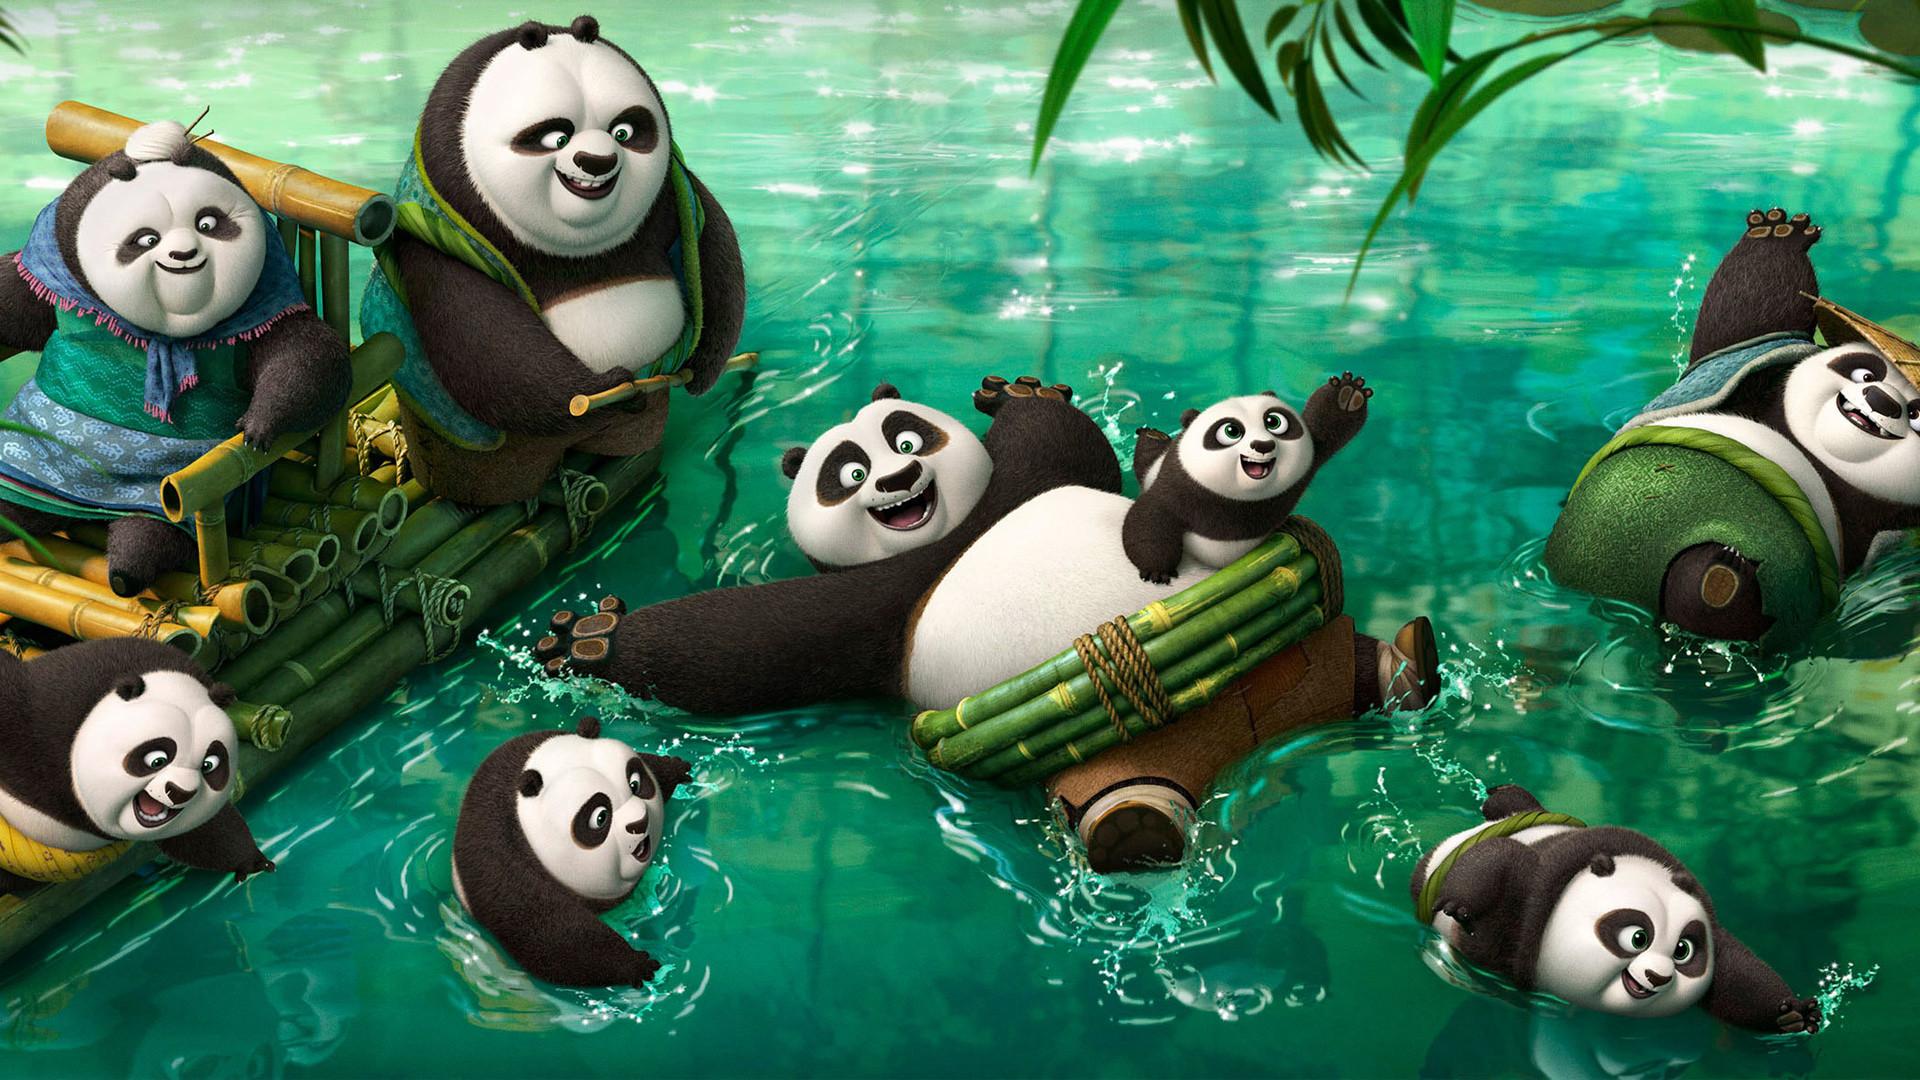 Kung fu Panda 3 New Pandas Wallpapers | HD Wallpapers